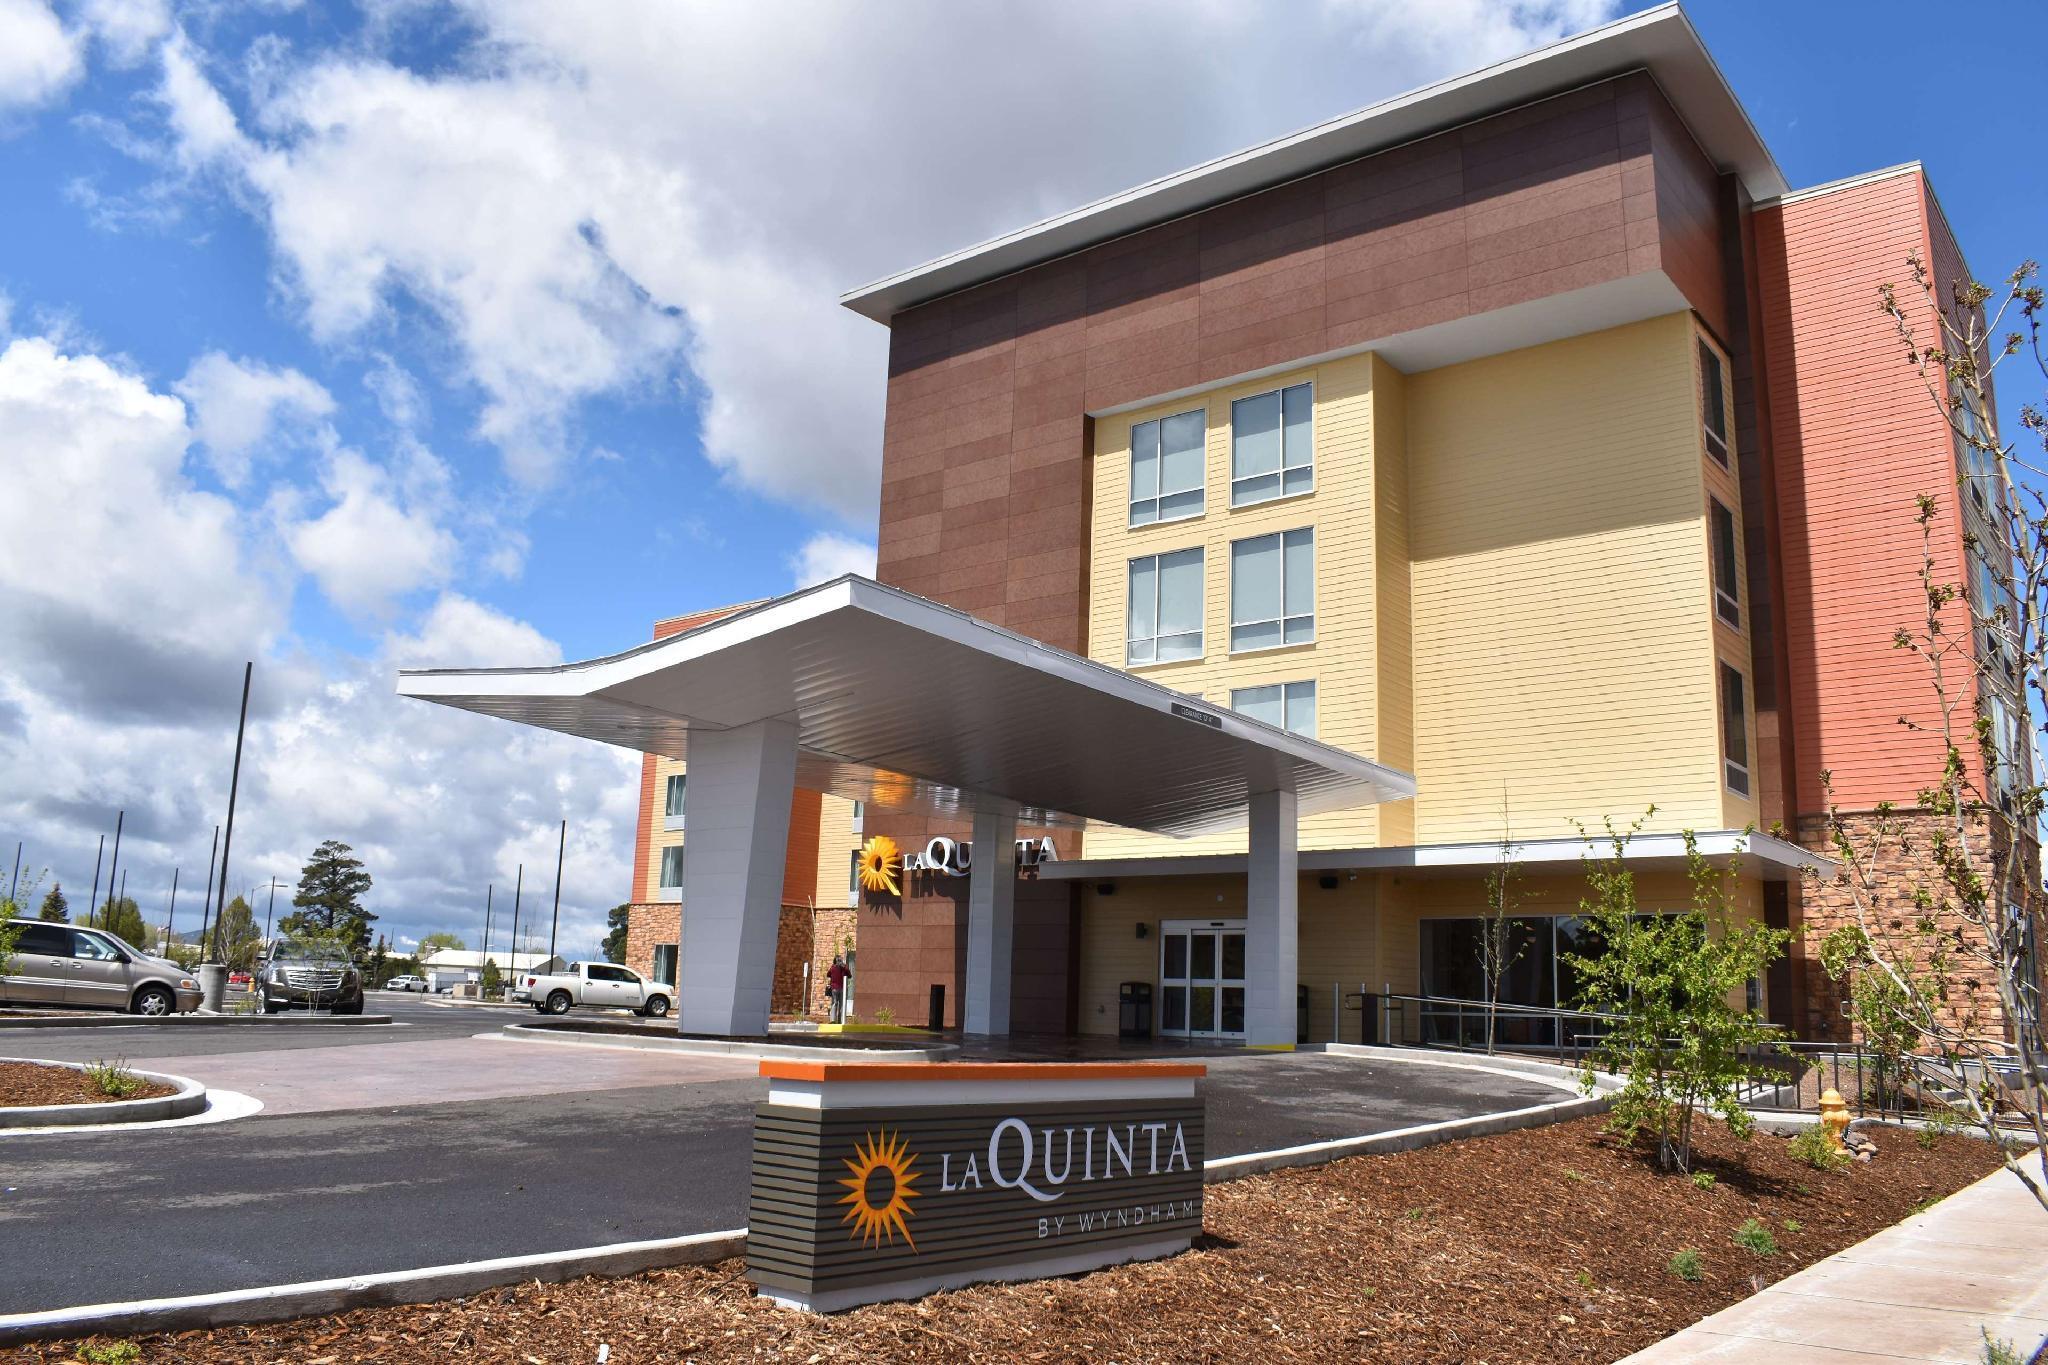 La Quinta Inn And Suites By Wyndham Flagstaff East I 40